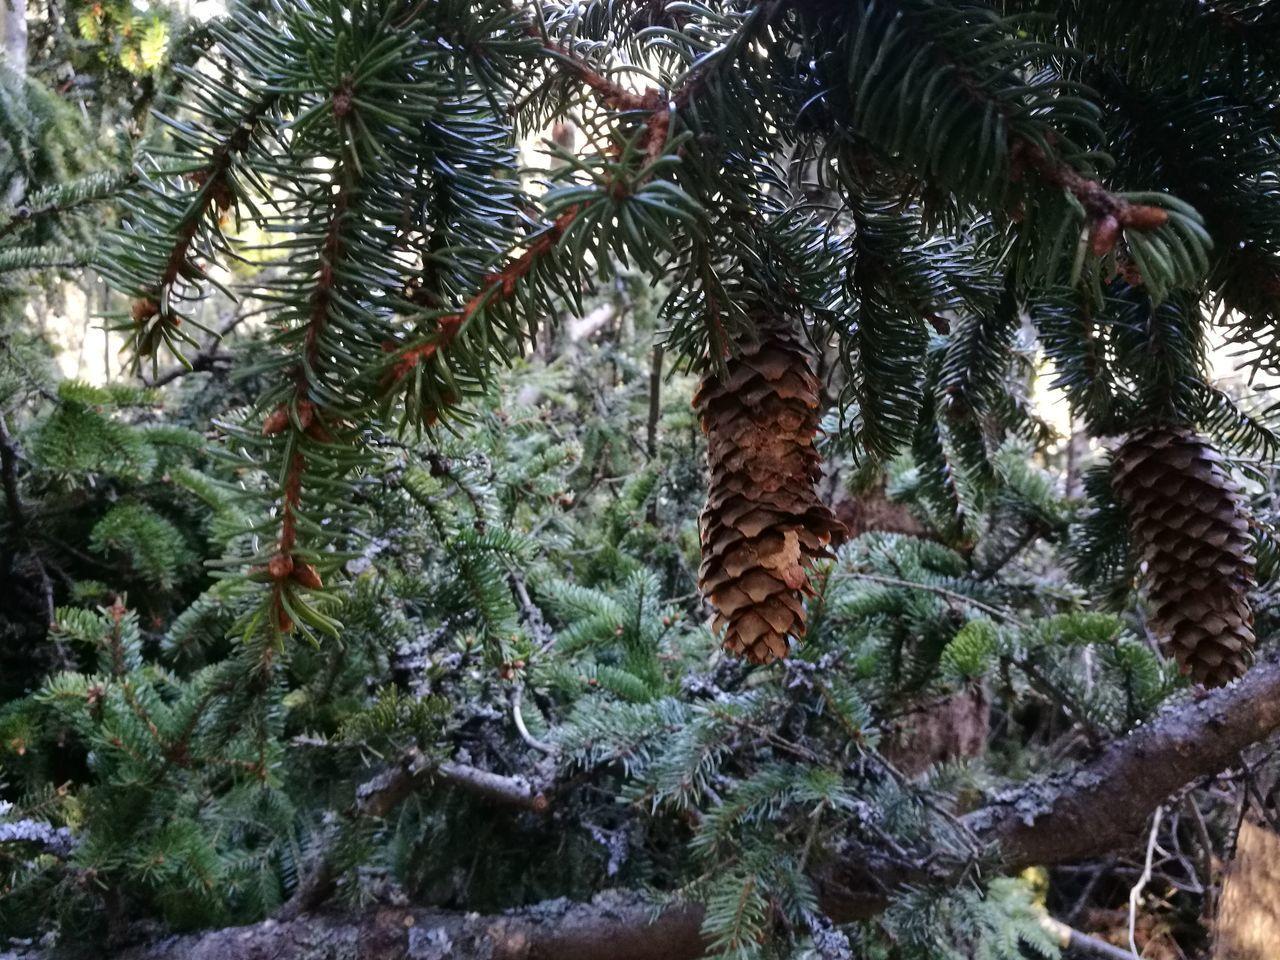 Pine Tree Pinecone Pinecones HuaweiP9